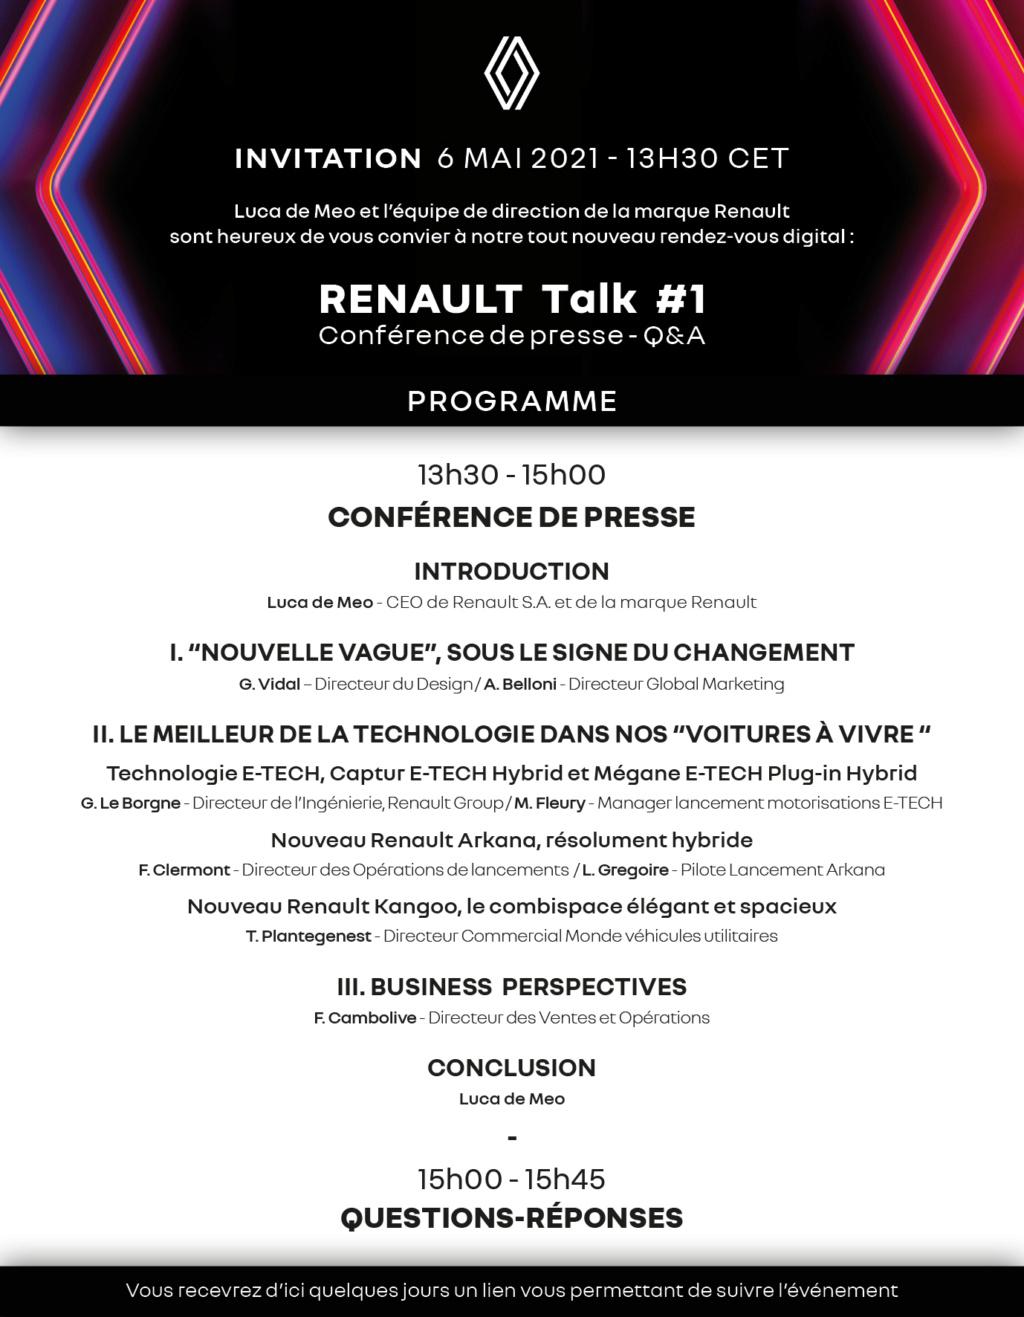 [Actualité] Alliance Renault-Nissan-Mitsubishi - Page 40 Progra10